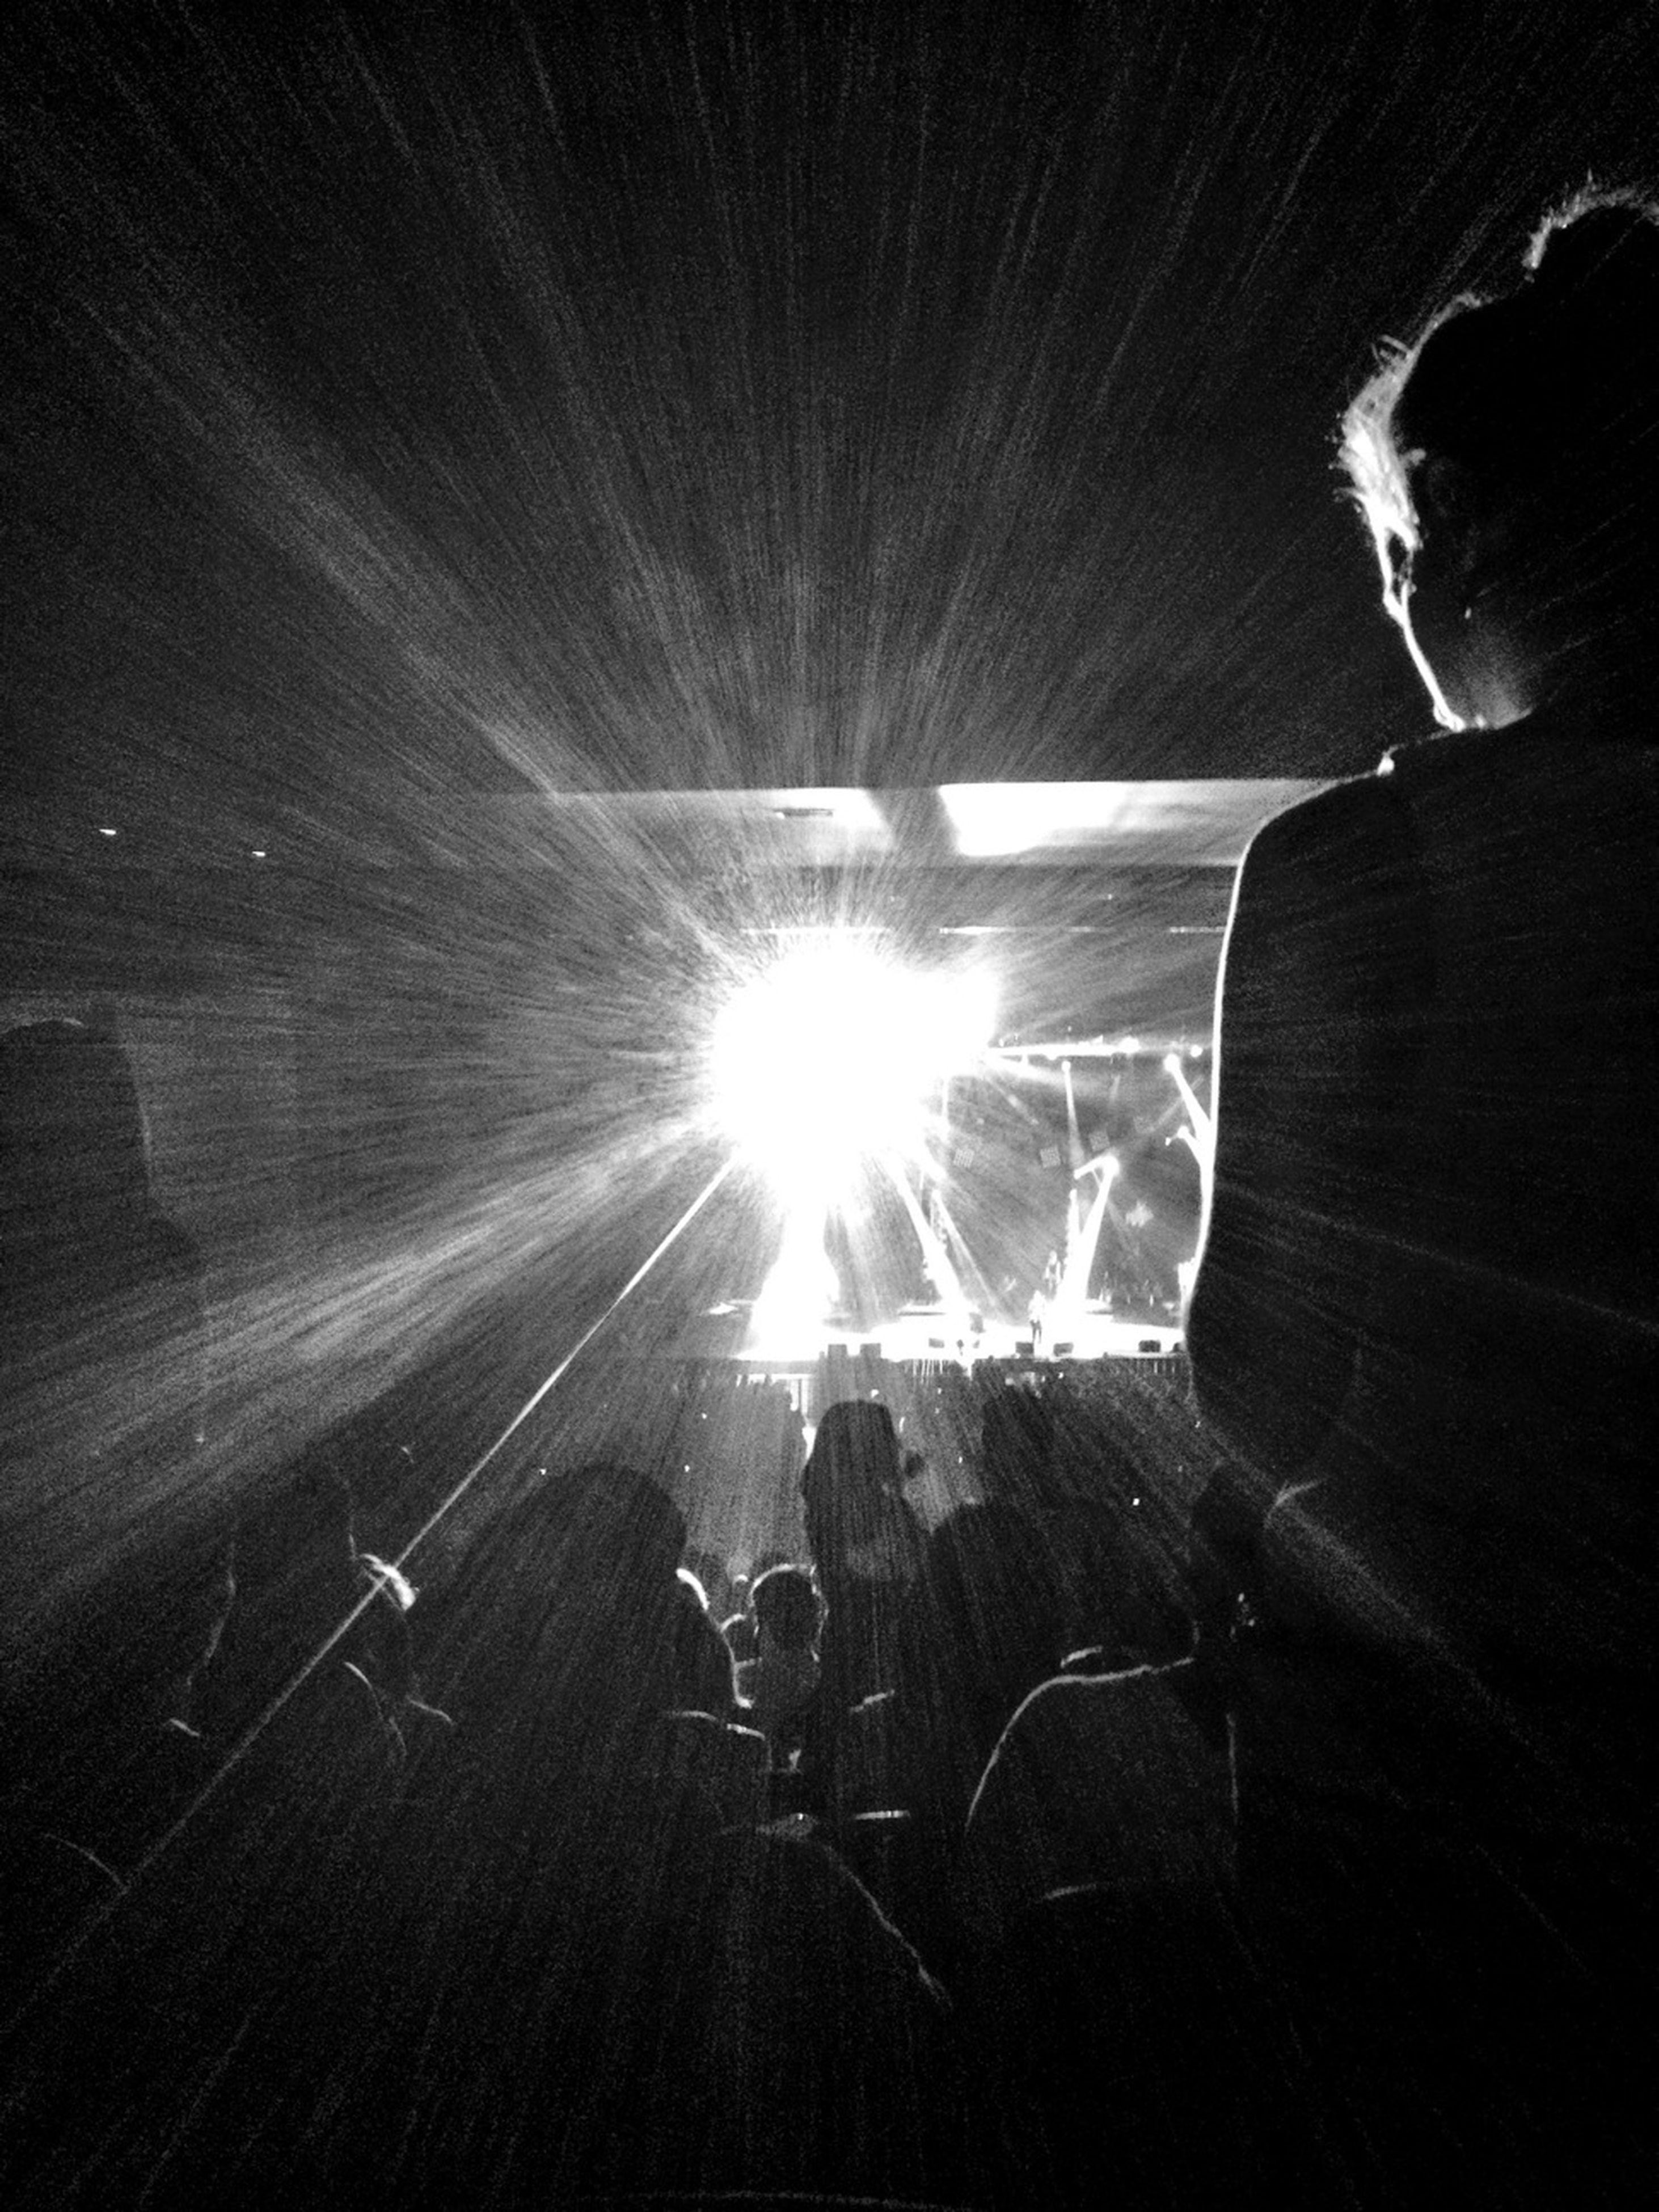 lifestyles, leisure activity, men, sunbeam, lens flare, sunlight, sun, silhouette, person, unrecognizable person, glowing, indoors, night, standing, light - natural phenomenon, dark